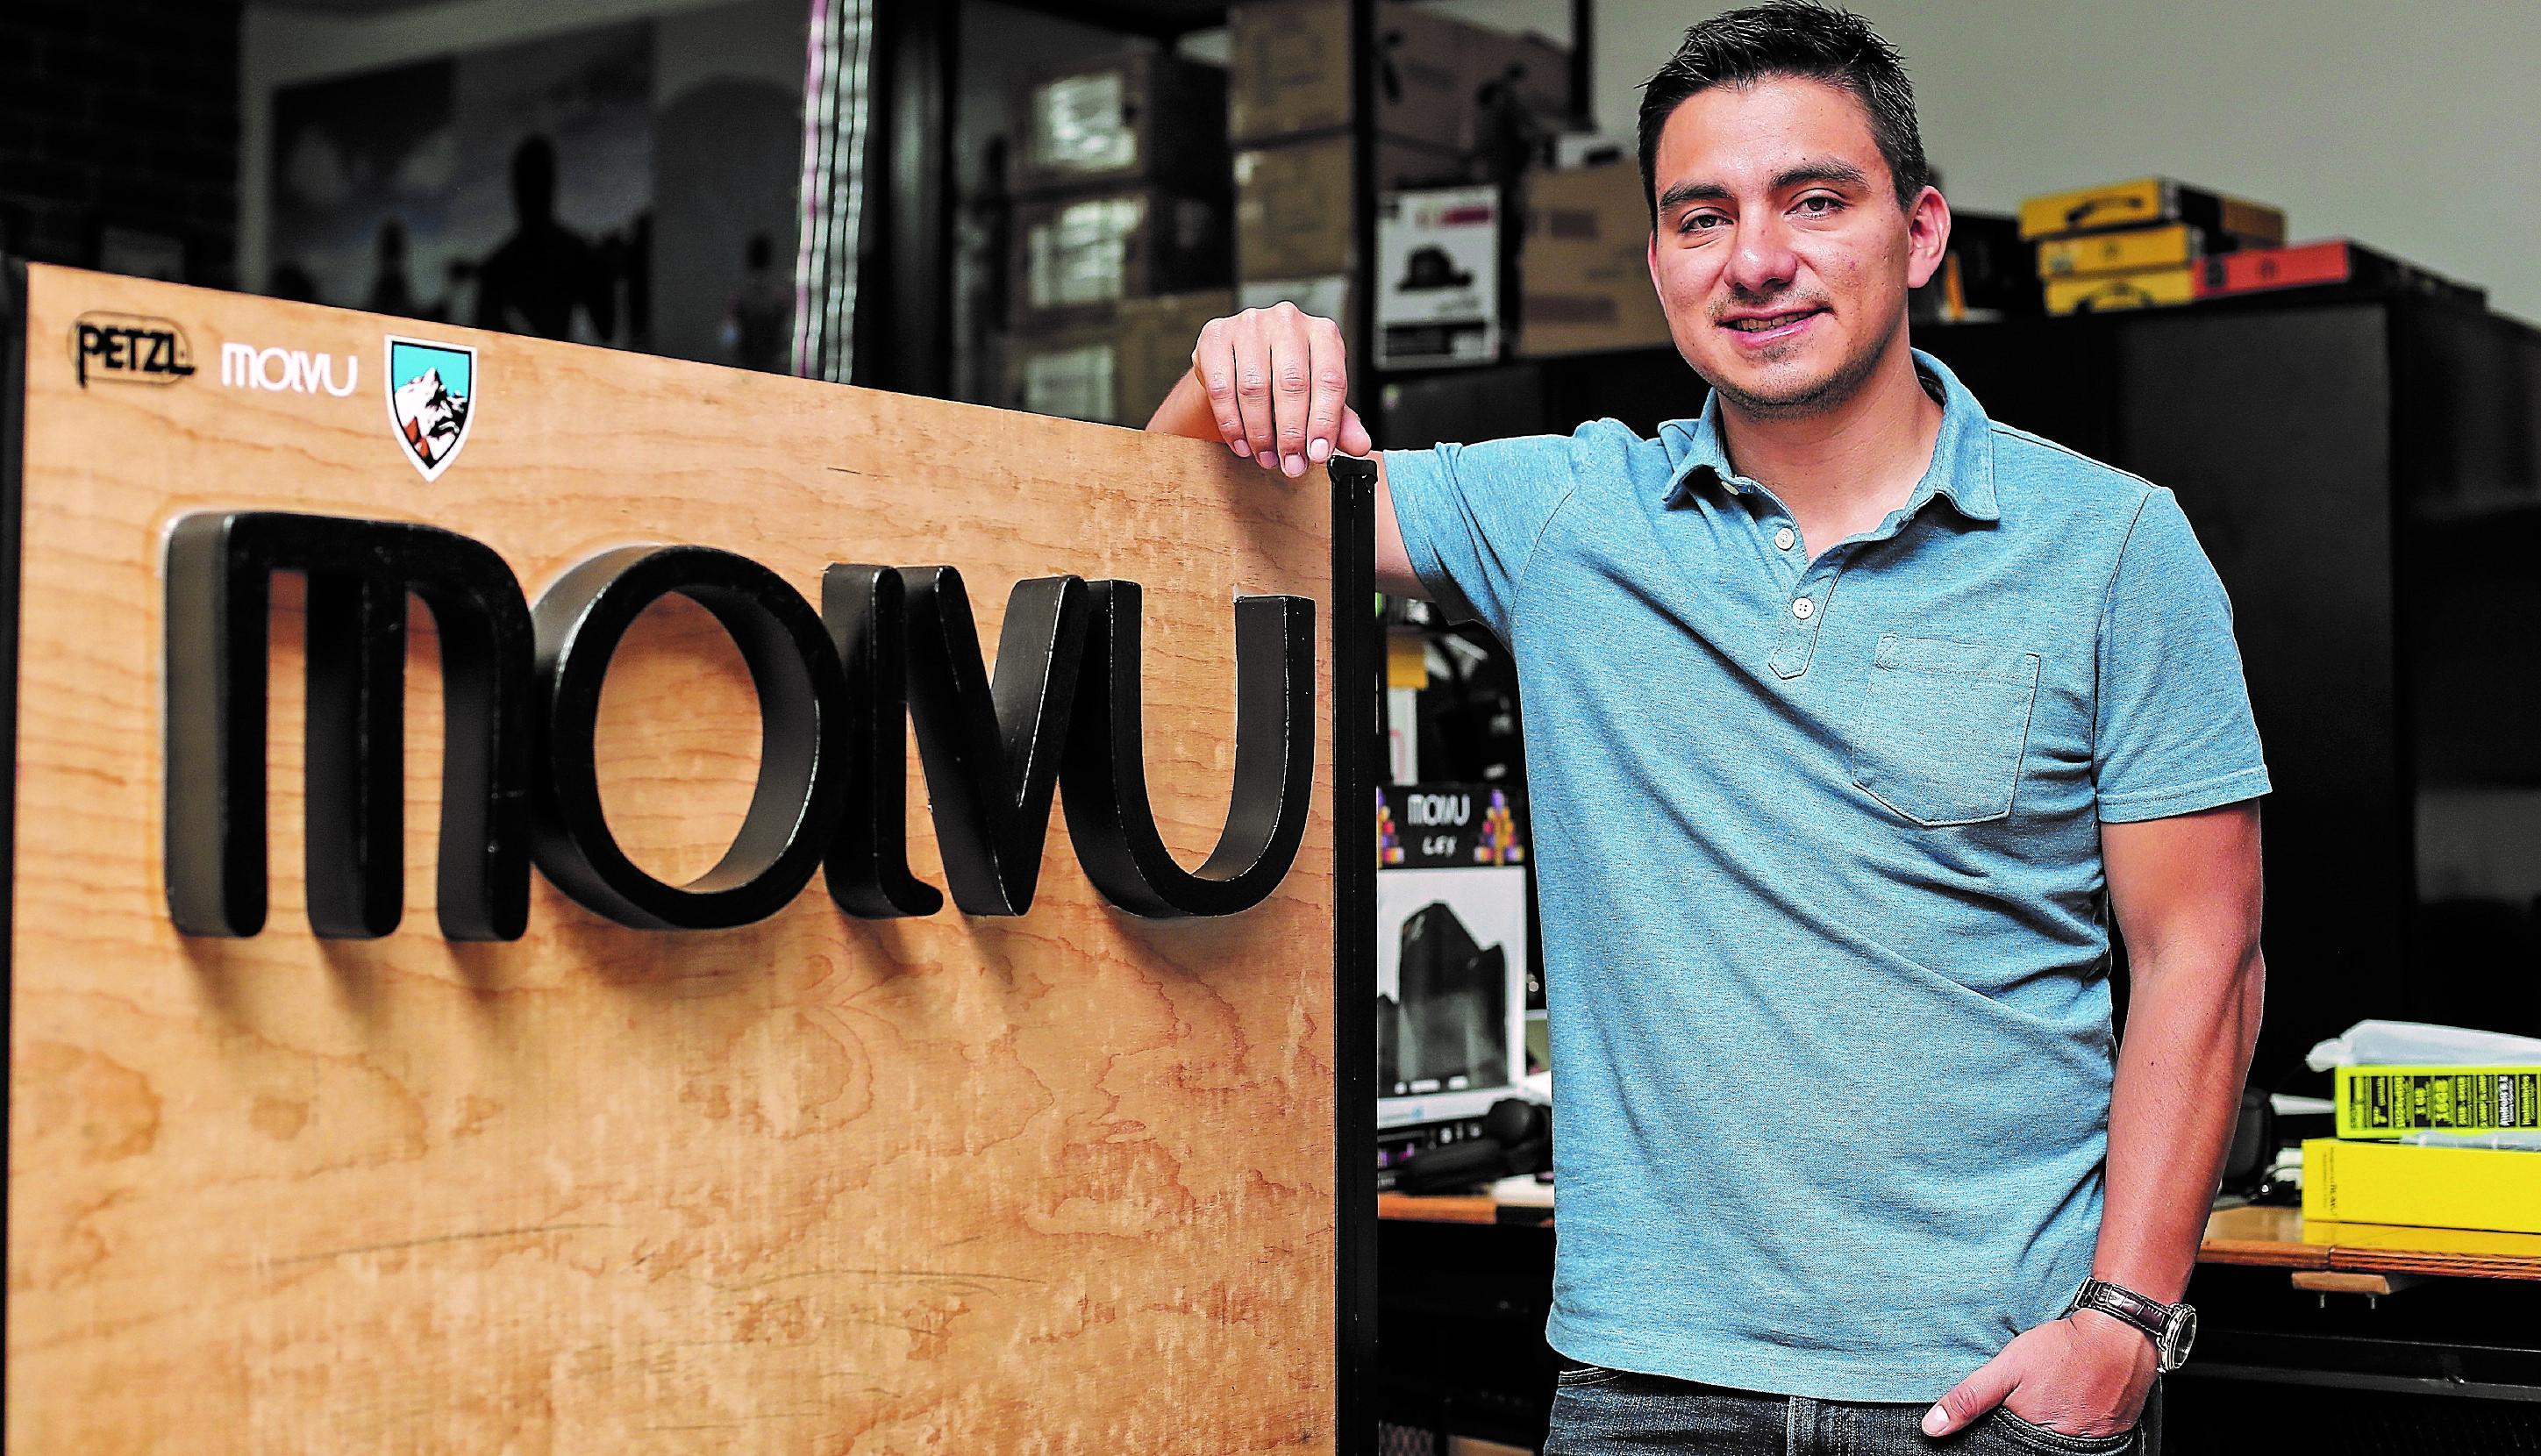 Kevin González ha sido emprendedor e innovador, dirige en forma exitosa la empresa Molvu, fabricante de tabletas. (Foto, Prensa Libre; Juan Diego González).